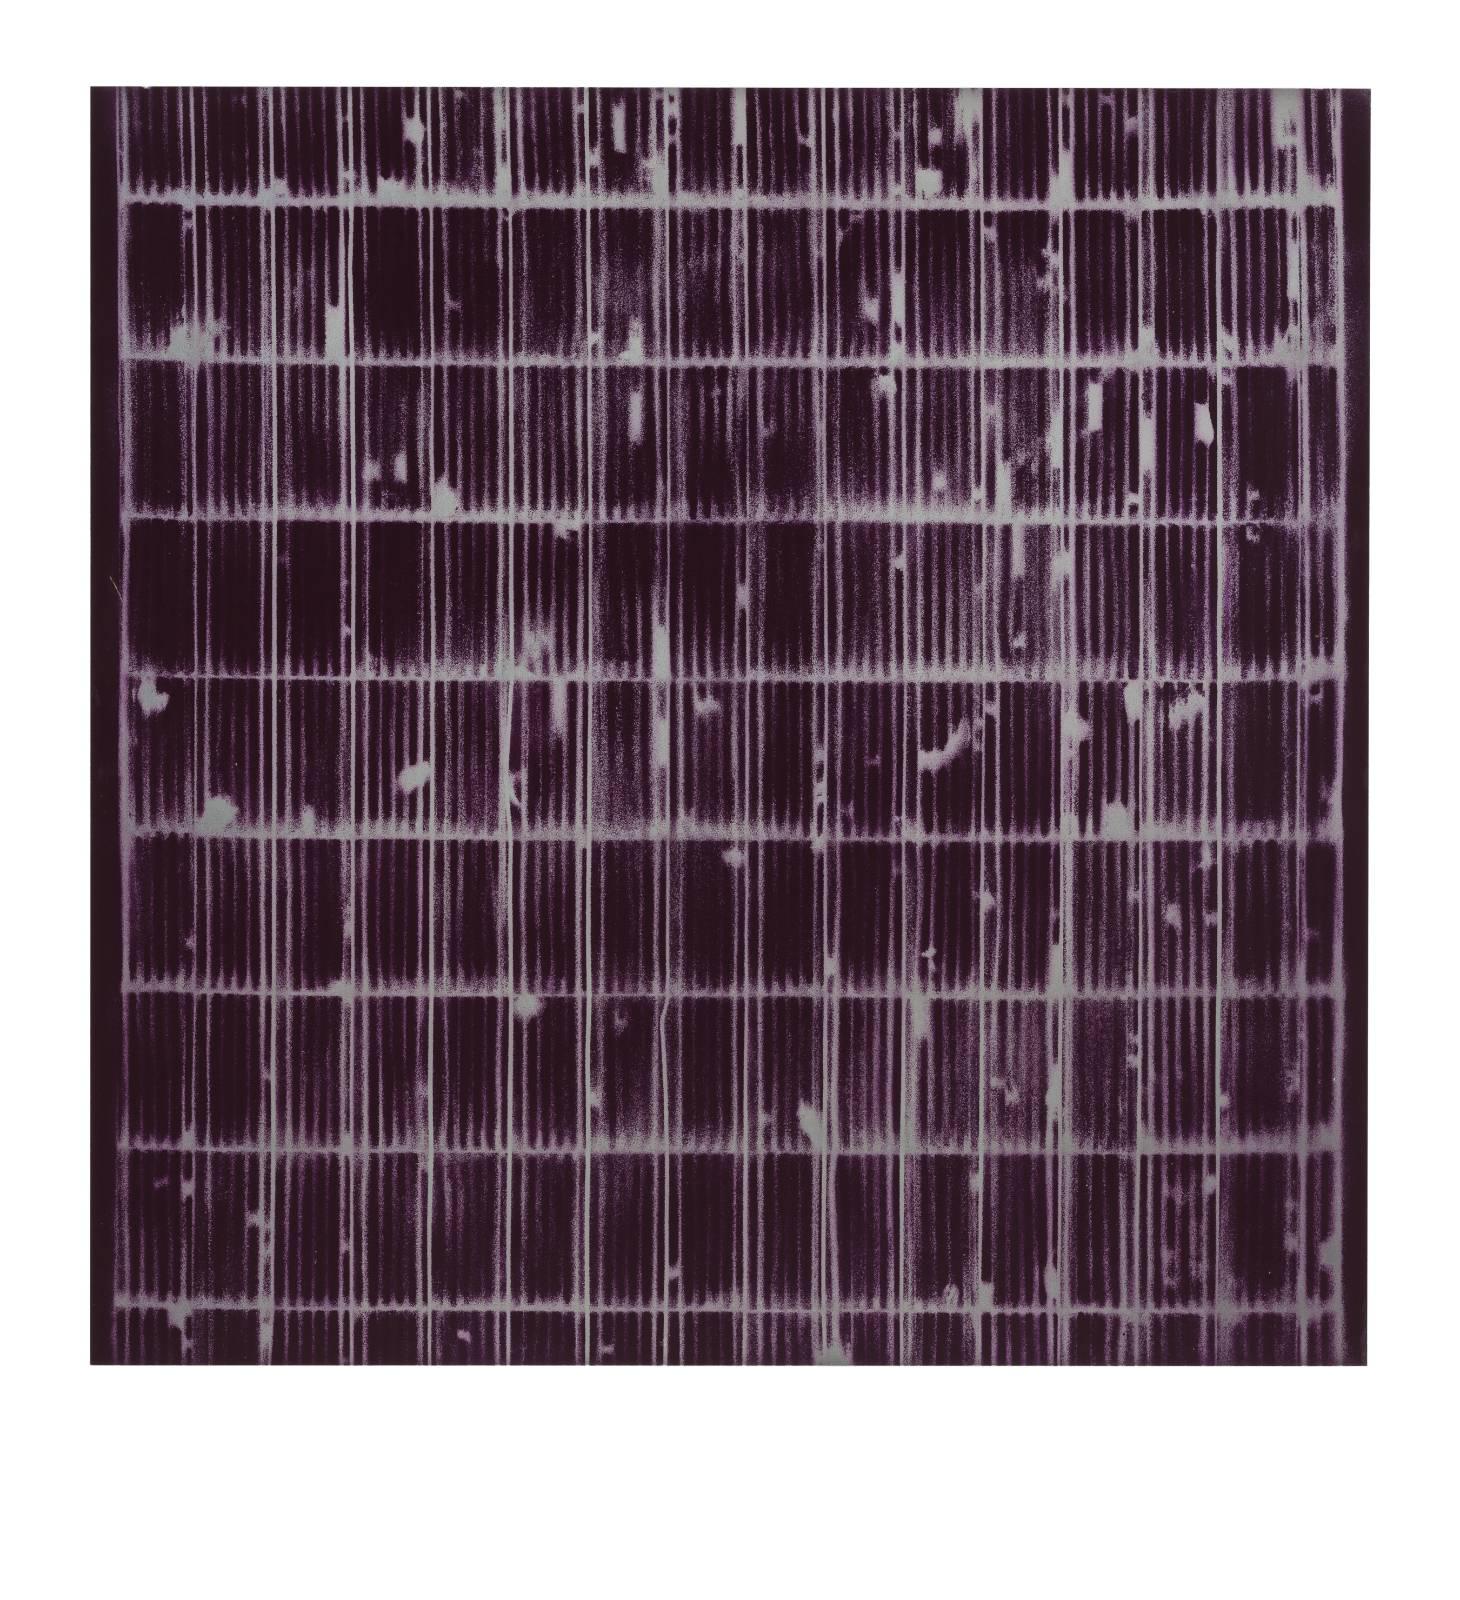 "STAIN : 55°42'16.3""N 13°11'58.8""E, 2016, spraypaint on aluminium, 81,3 x 81,3 cm"